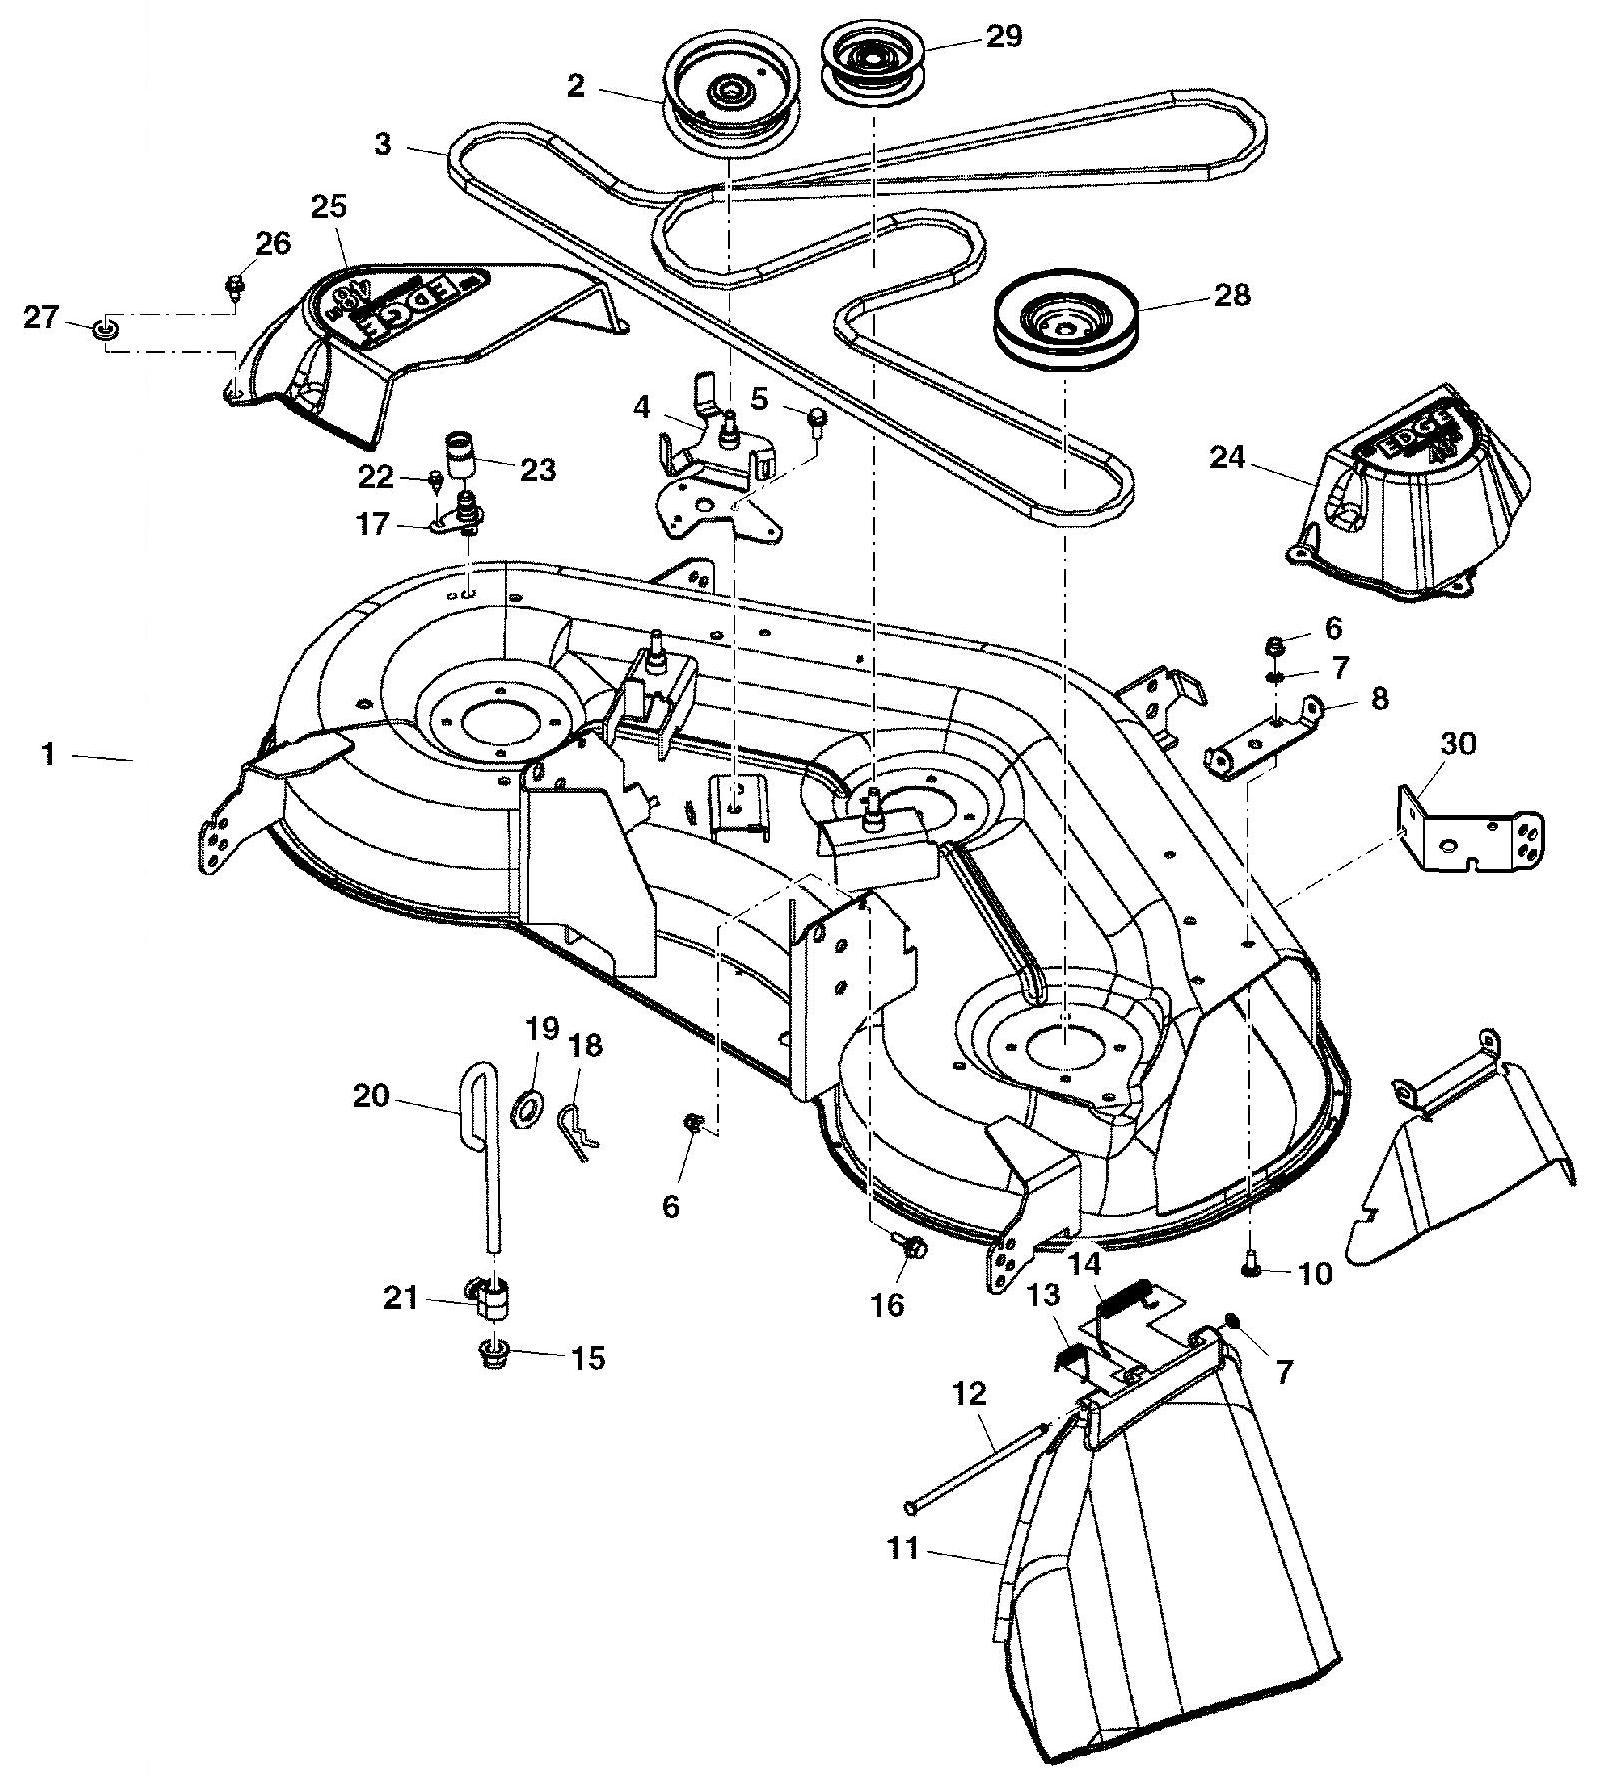 John Deere Parts Diagrams Www Gator 6x4 Wiring Diagram Free Picture Images